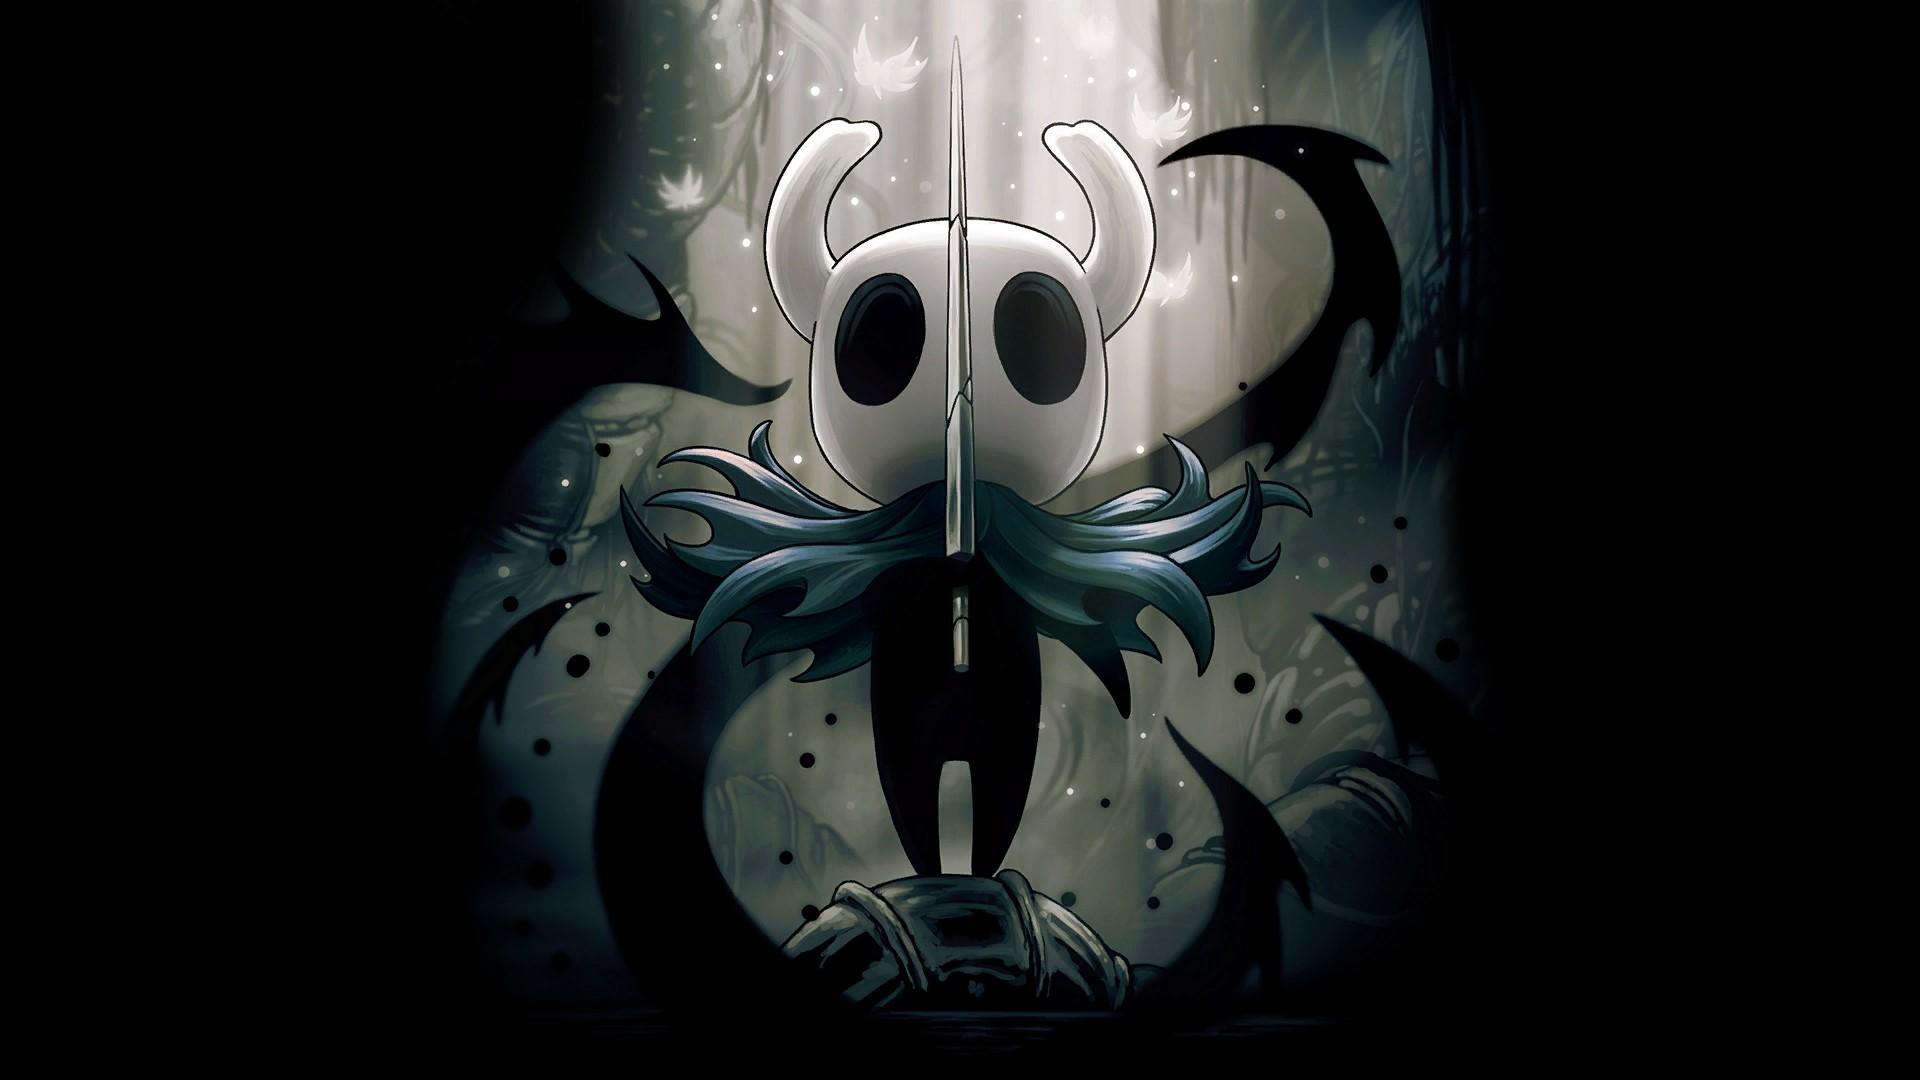 Hollow Knight Wallpaper